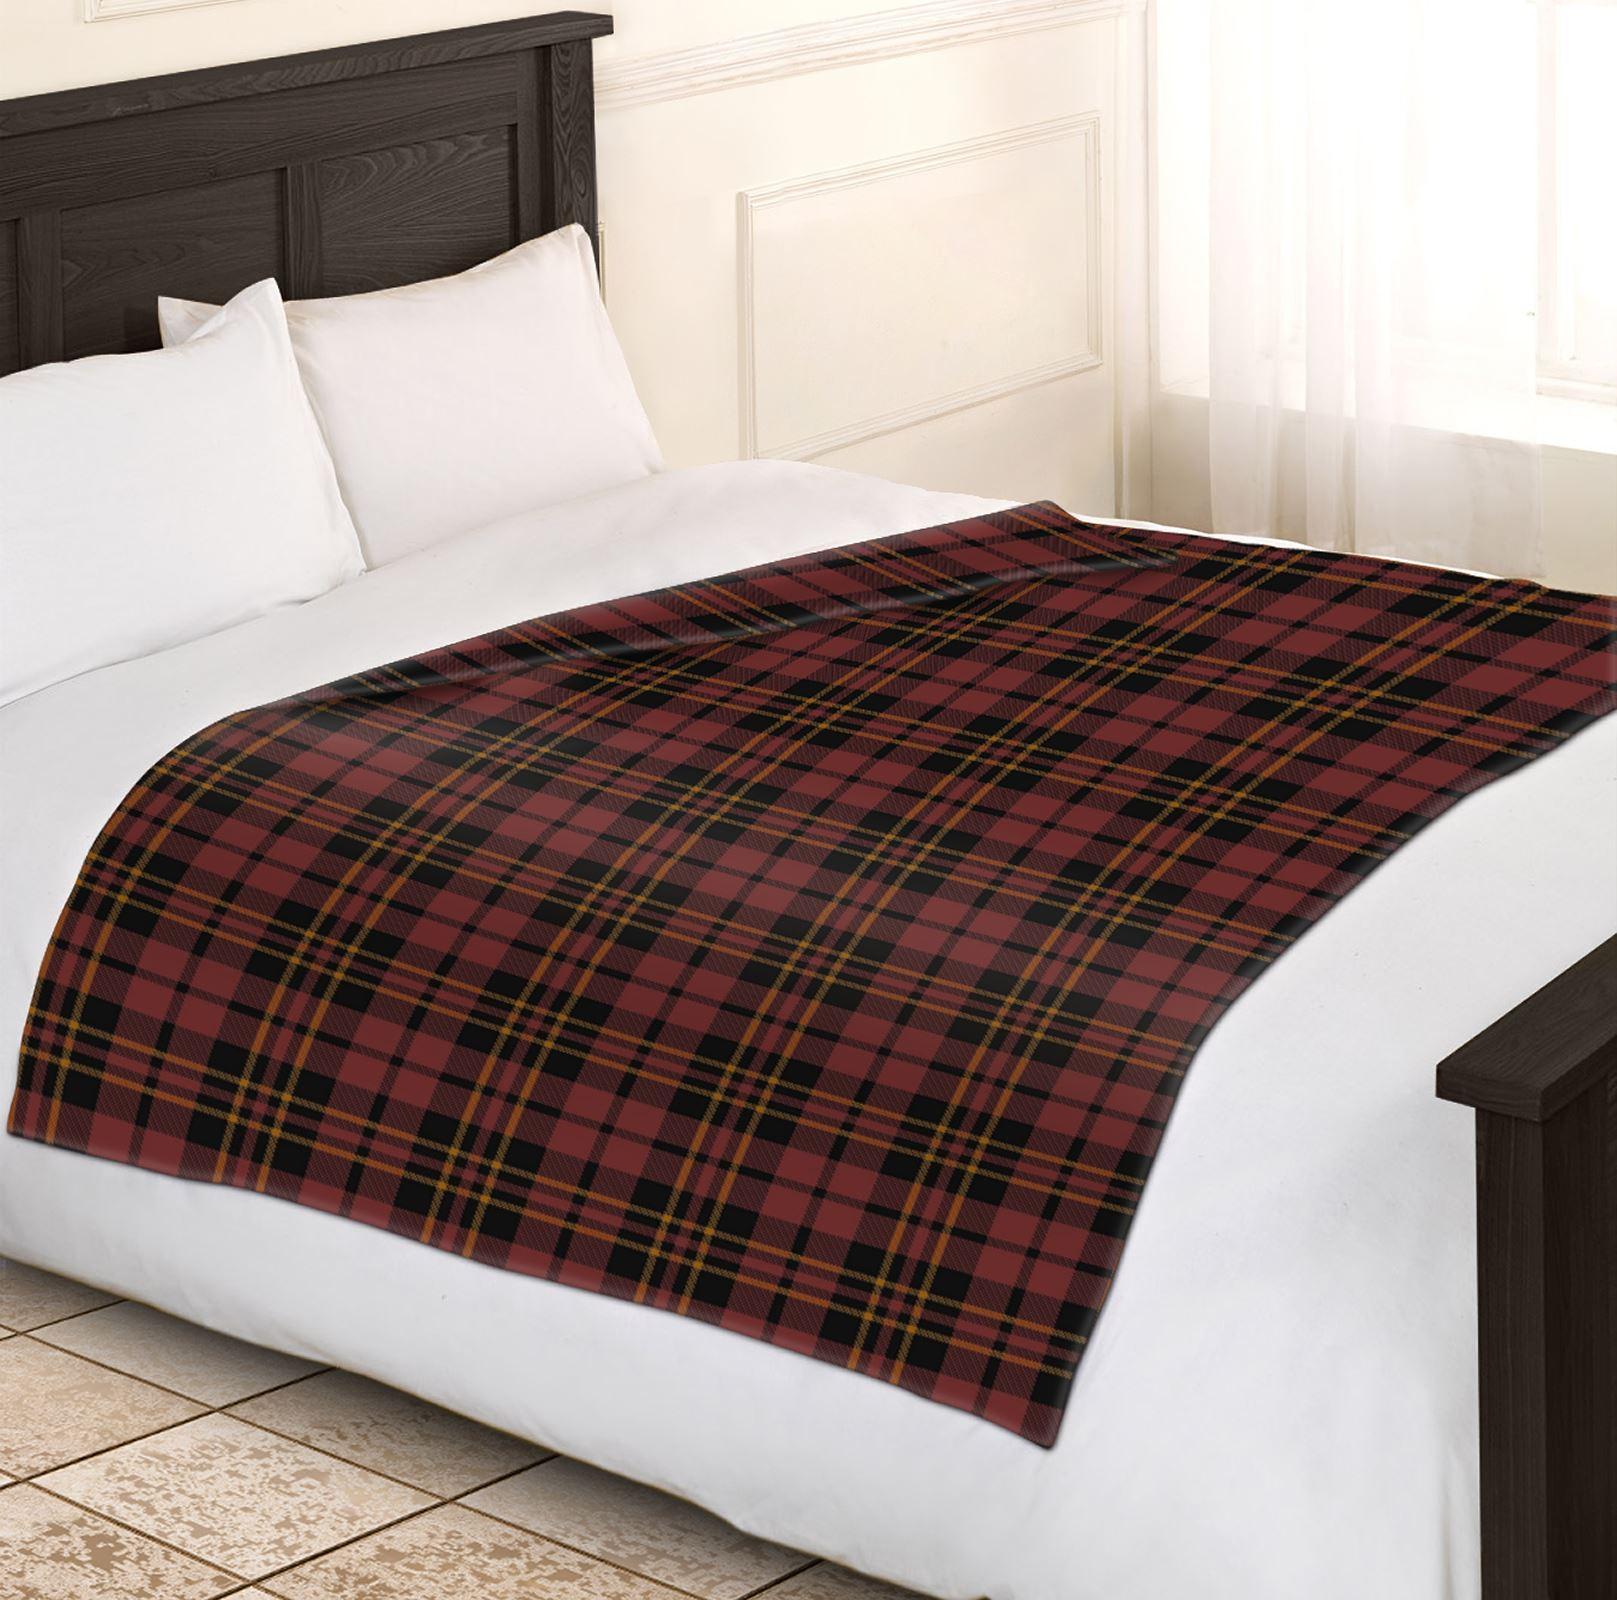 Soft-Warm-Check-Blanket-Brown-Single-Double-King-Tartan-Sofa-Throw-Bed-Fleece thumbnail 8